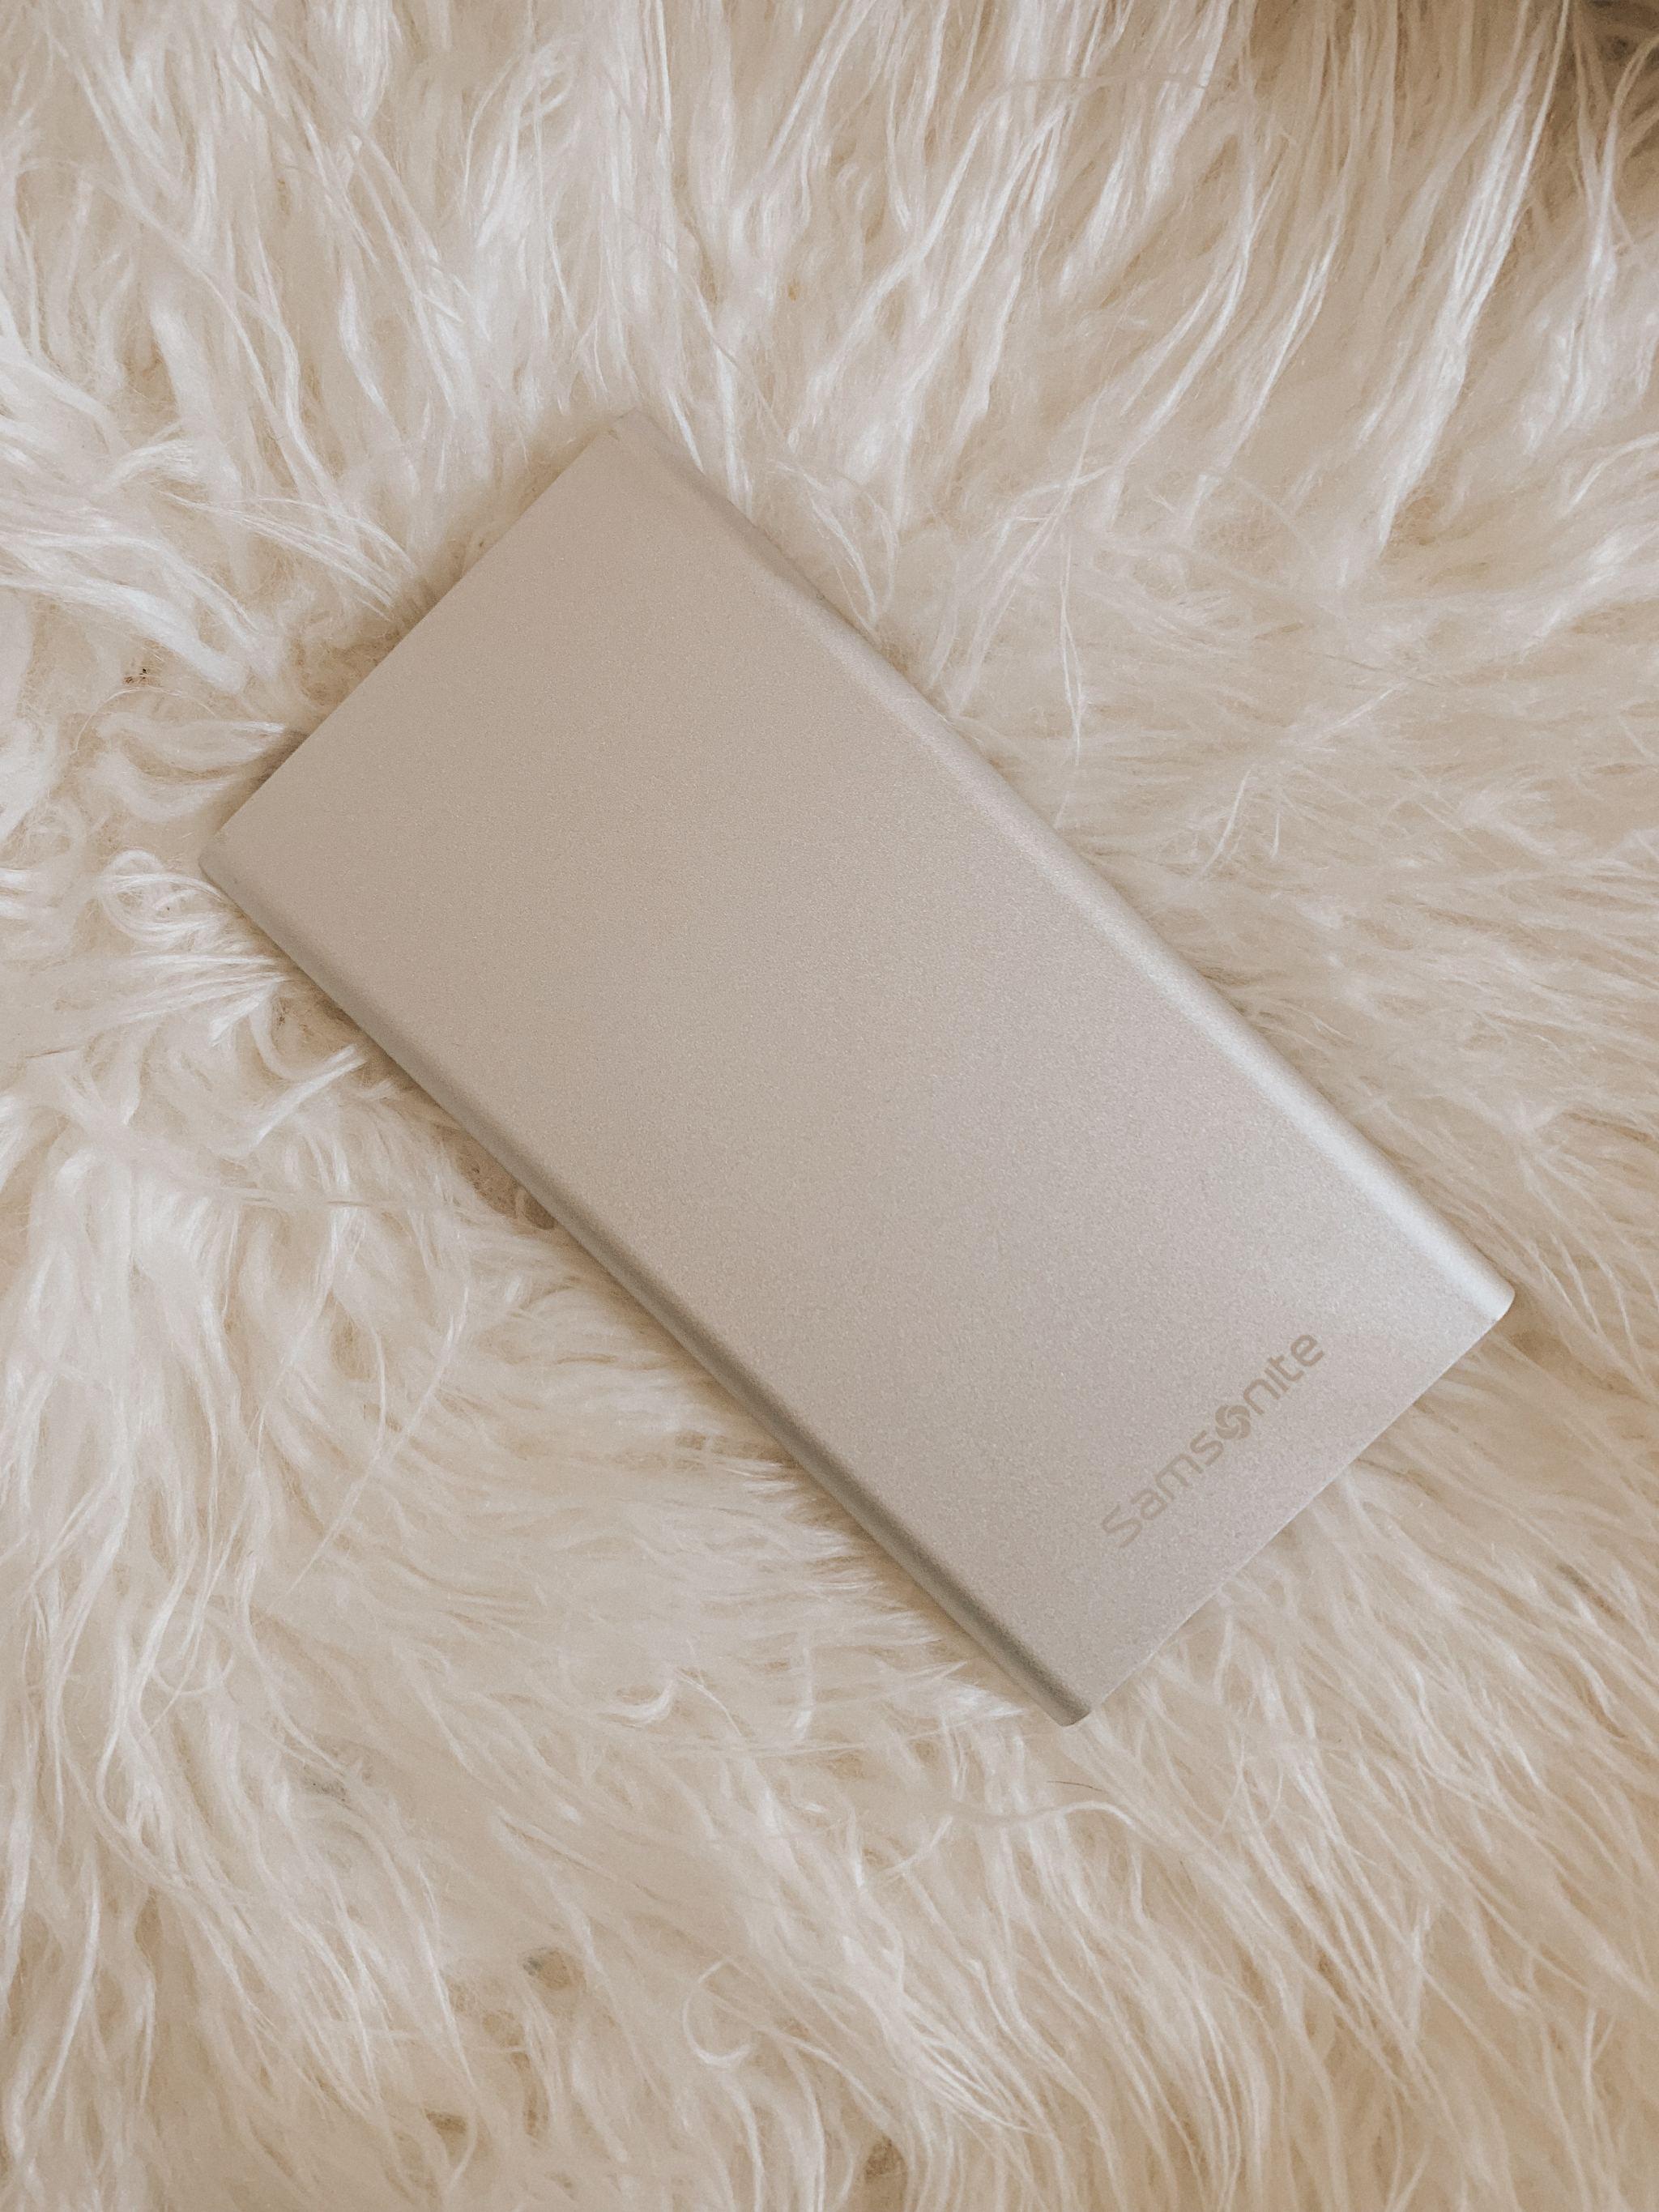 samsonite portable phone charger